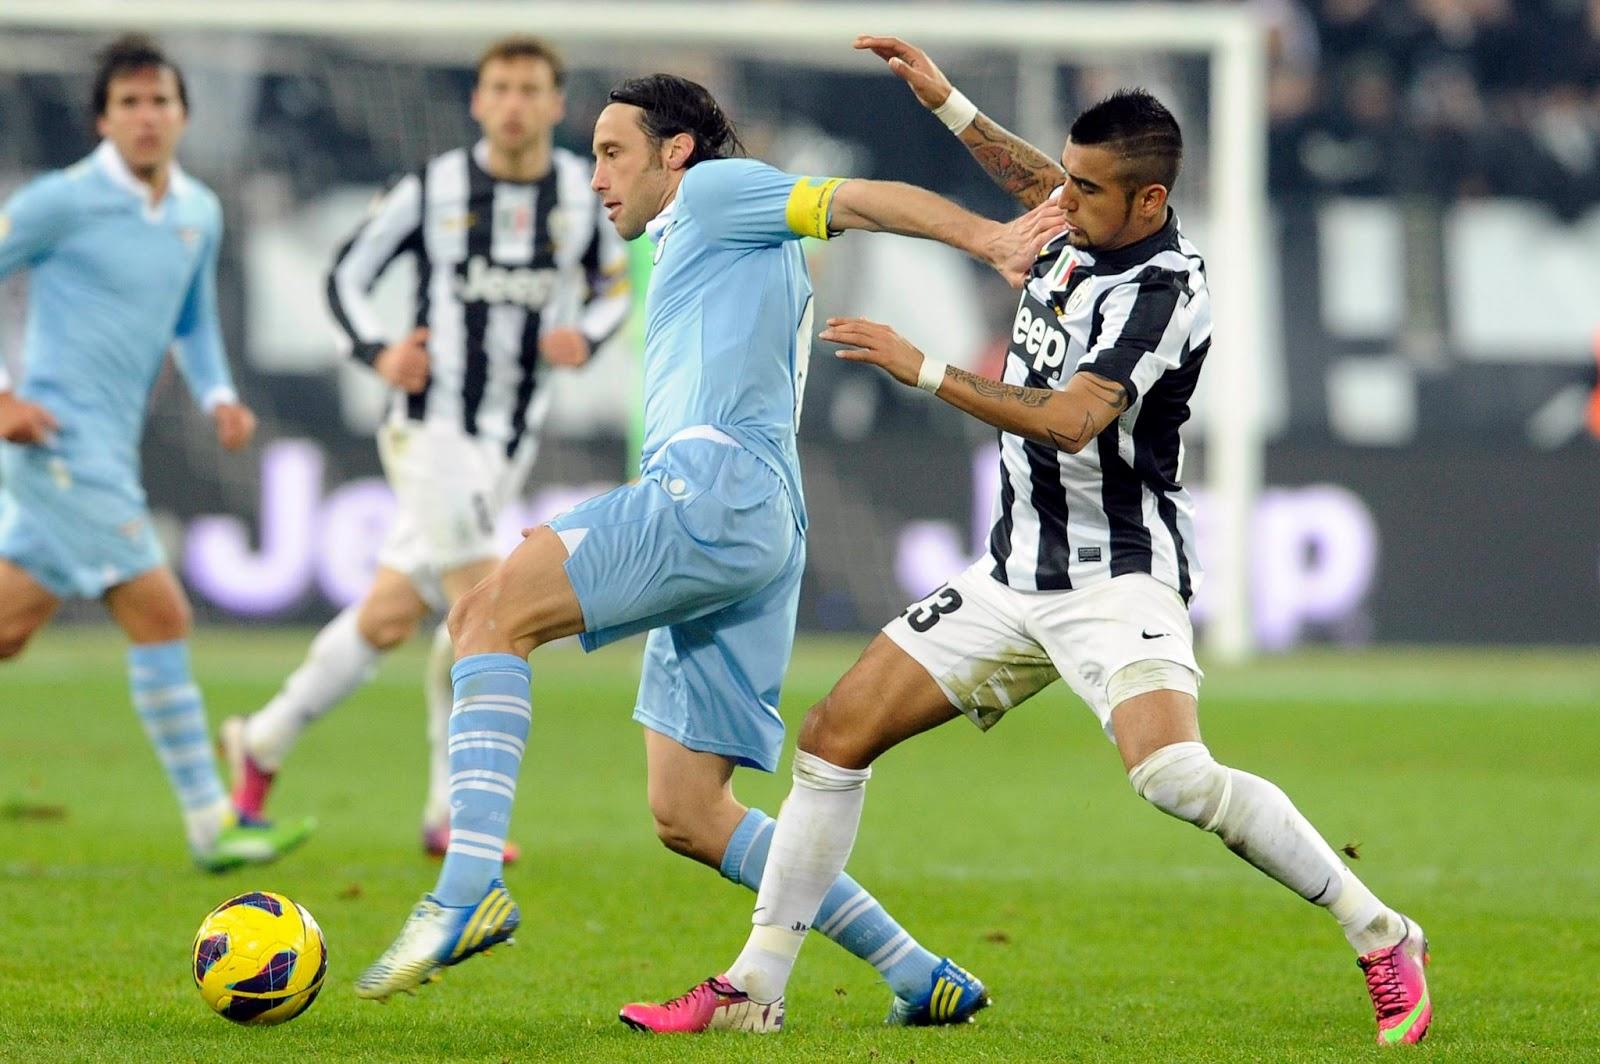 Italy Super Cup Juventus Vs Lazio 08 August U00ab The New Ball